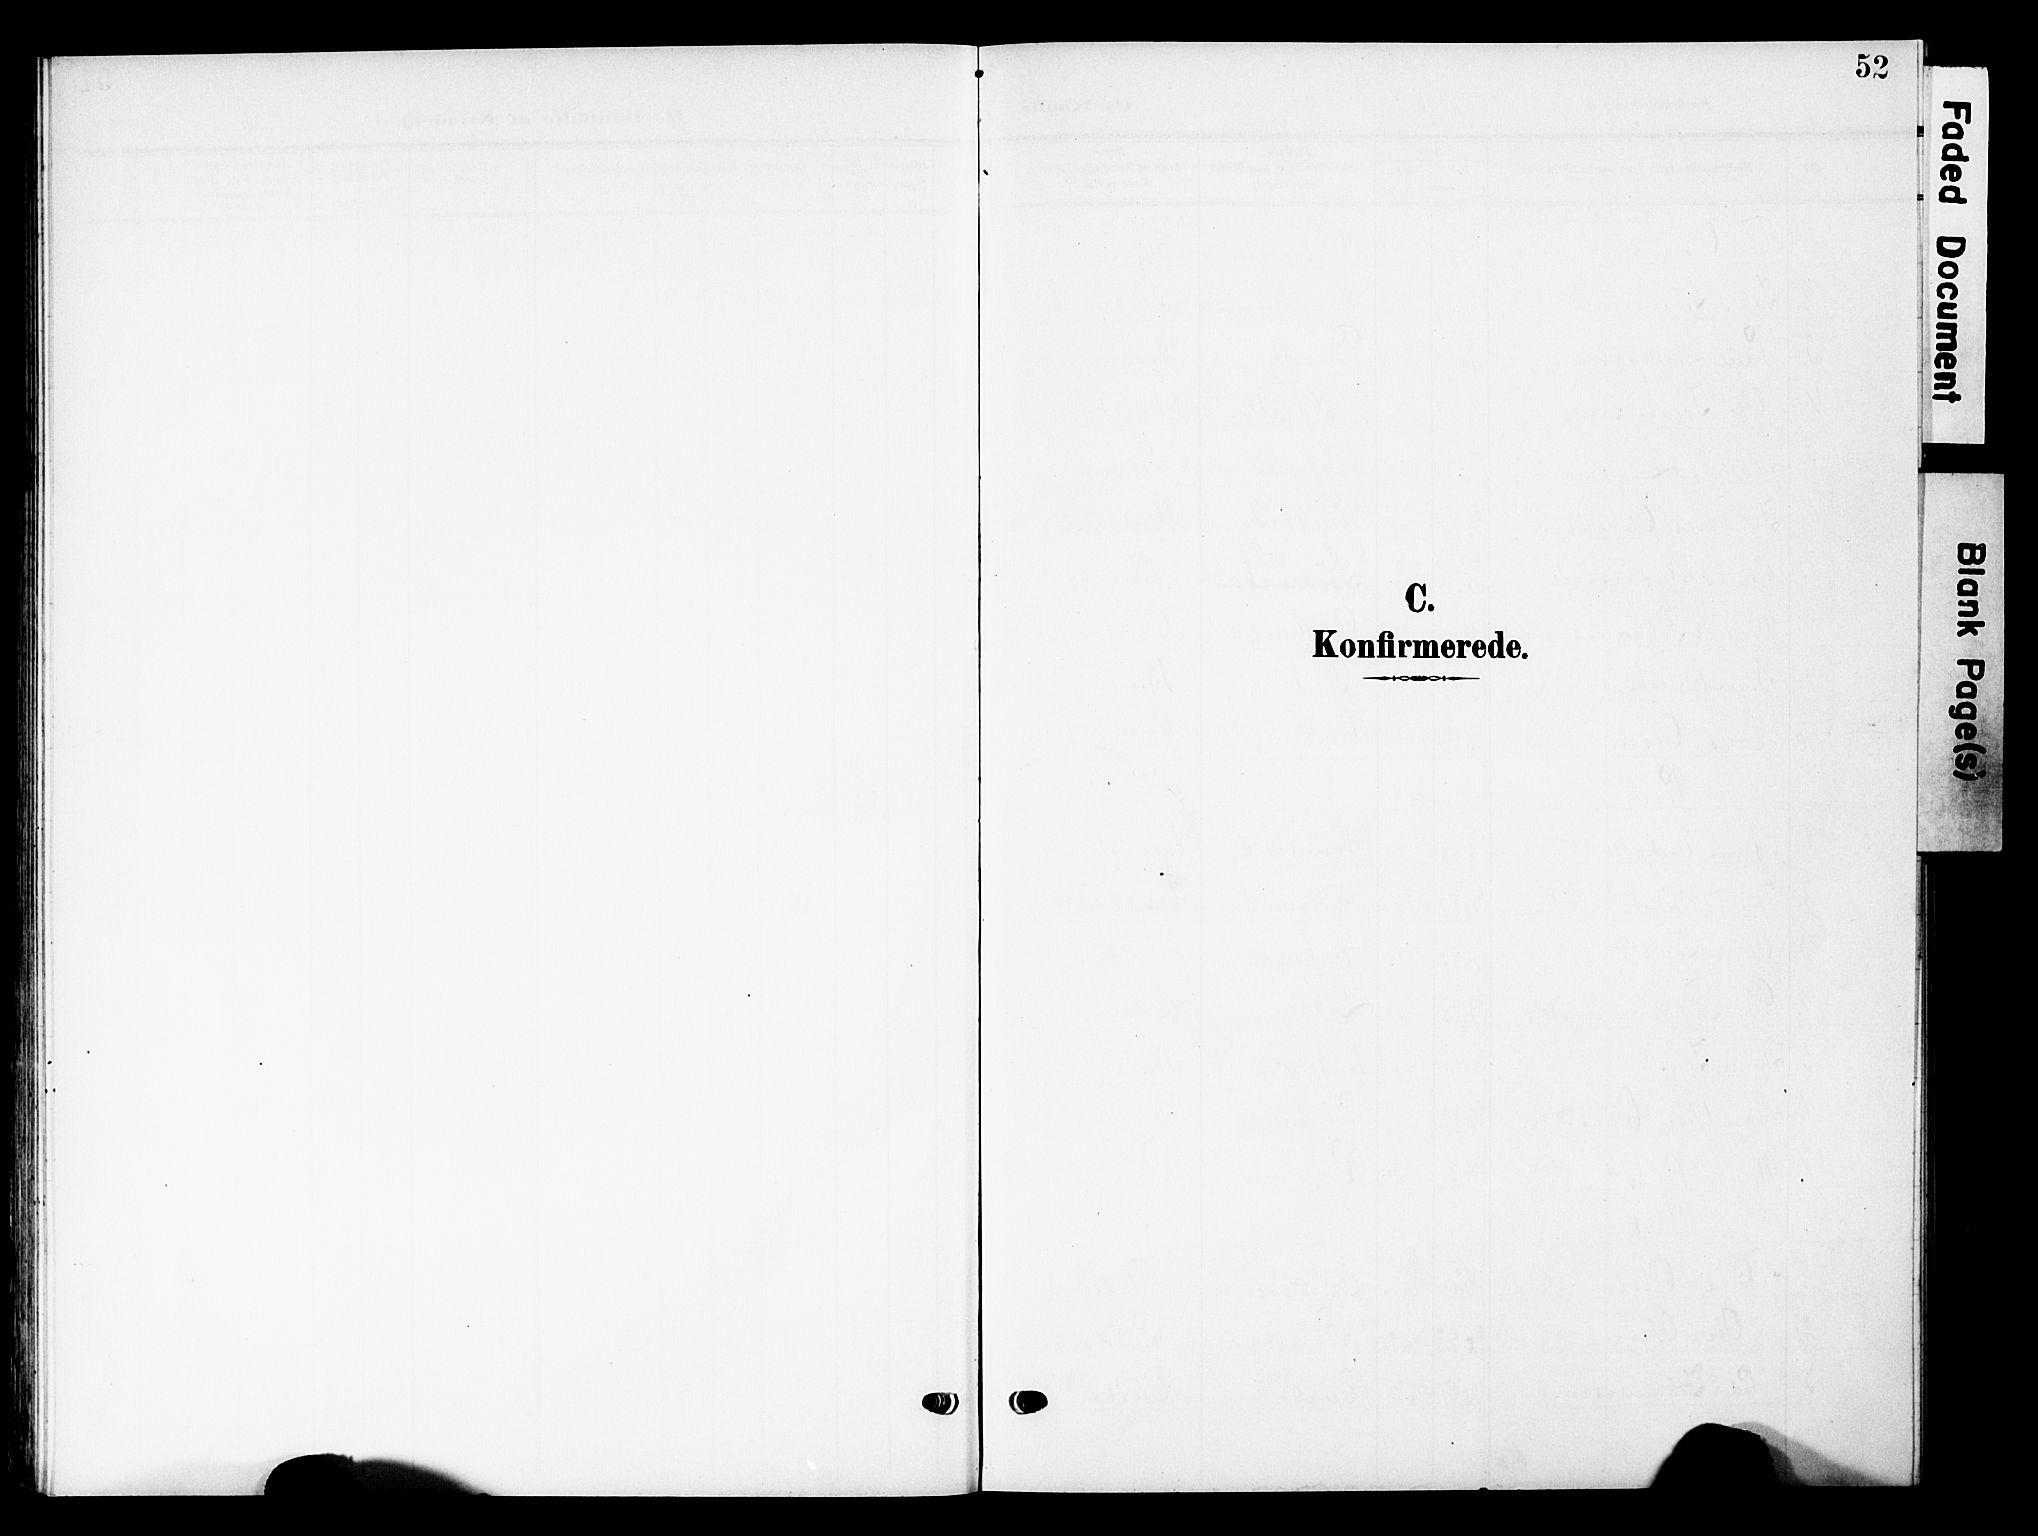 SAH, Lesja prestekontor, Klokkerbok nr. 8, 1905-1931, s. 52